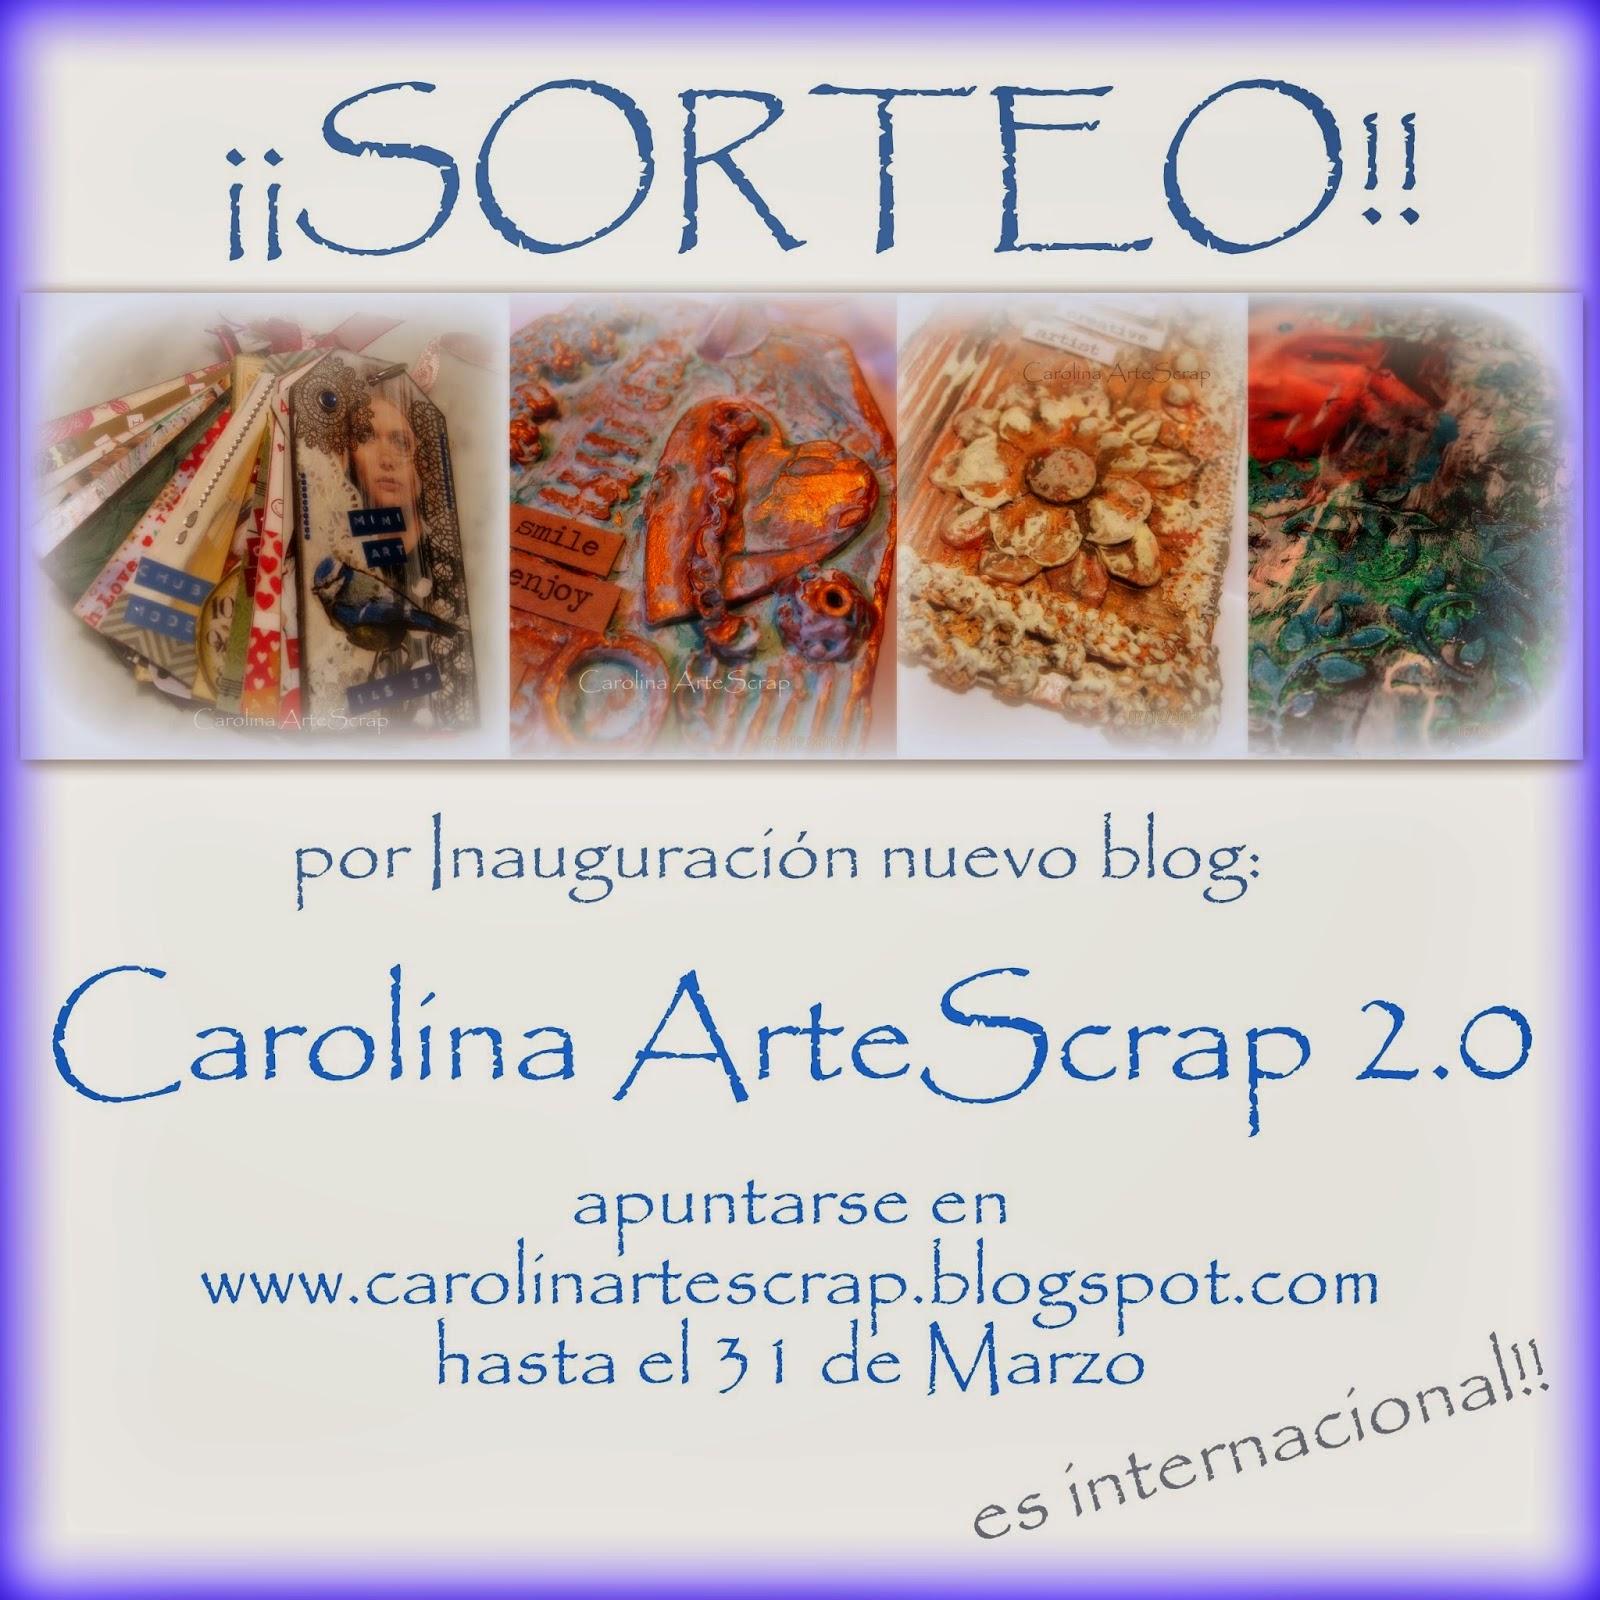 Sorteo de Carolina Arte Scrap